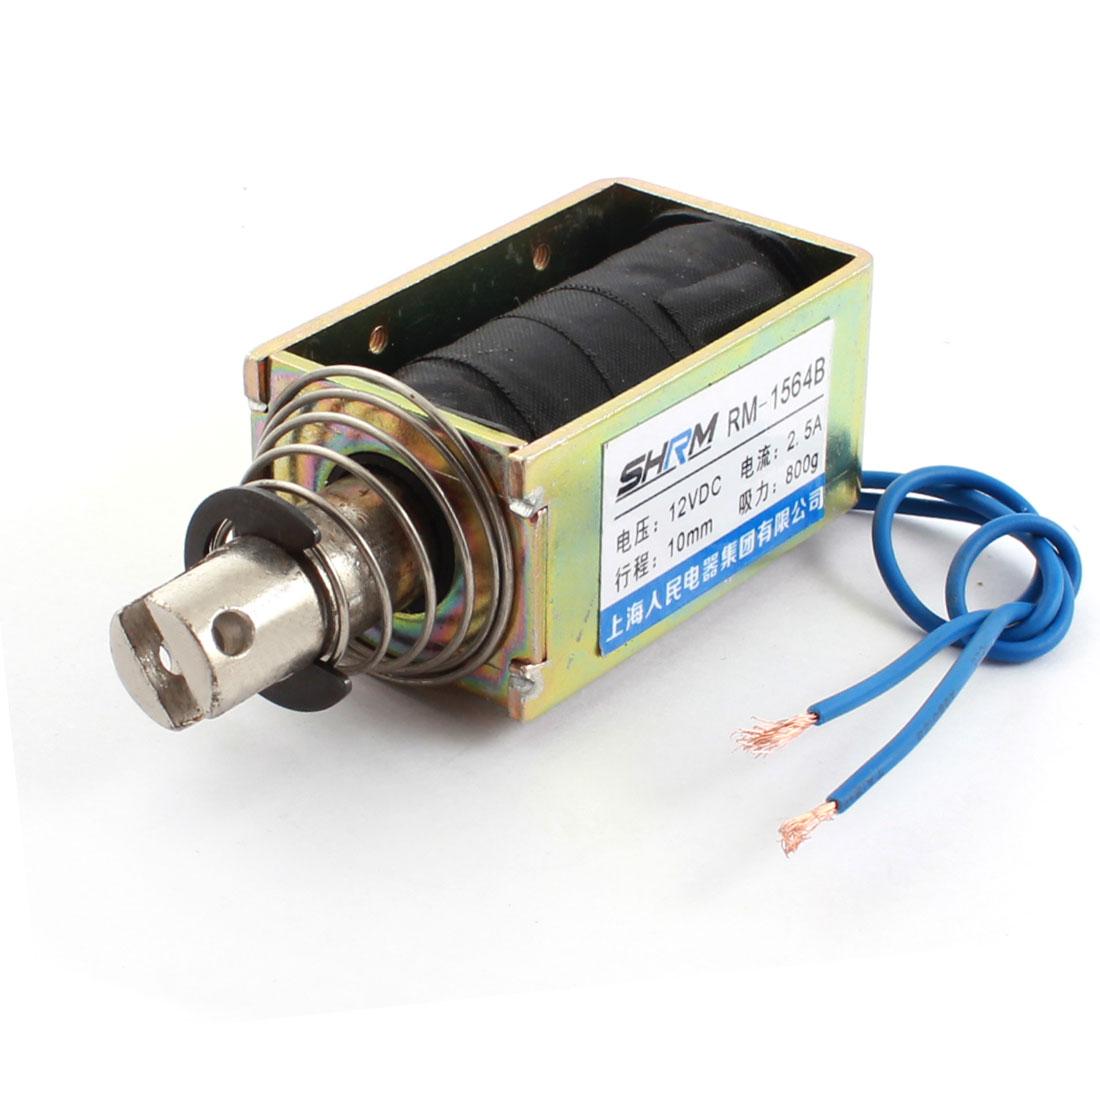 DC 12V 800g/10mm Open Frame Actuator Linear Push Pull Solenoid Electromagnet